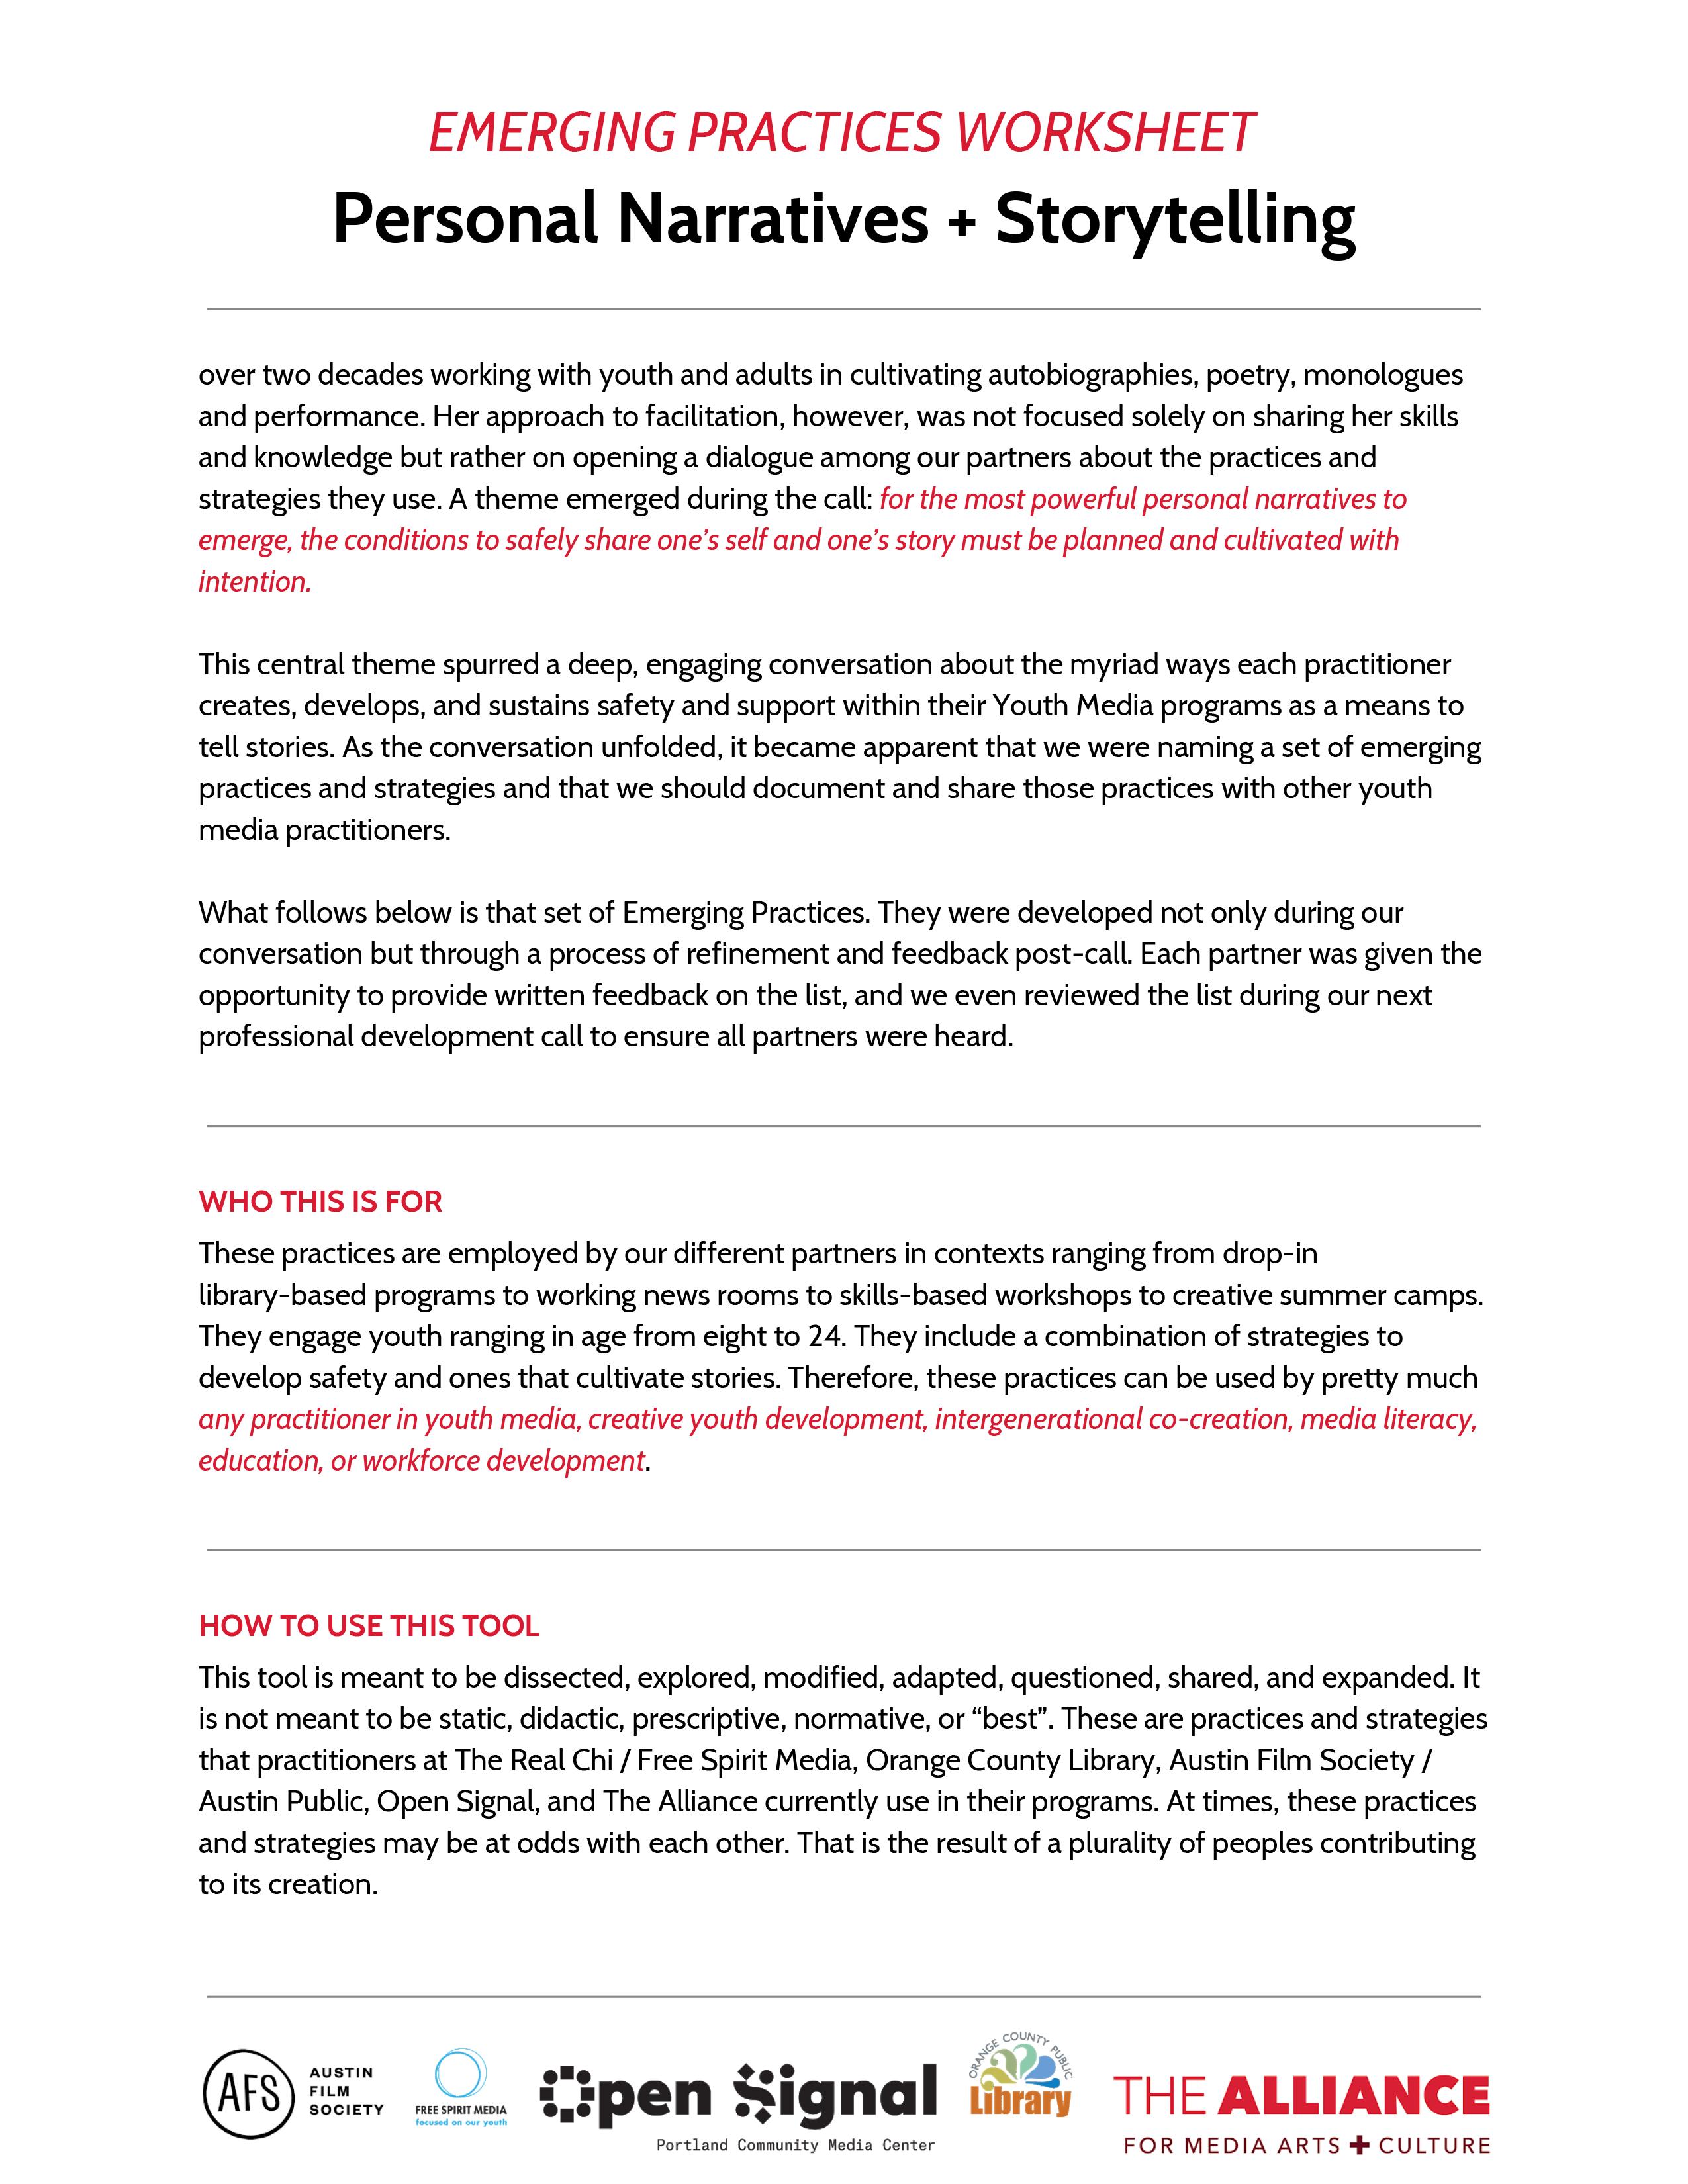 Worksheet Personal Narrative Storytelling The Alliance